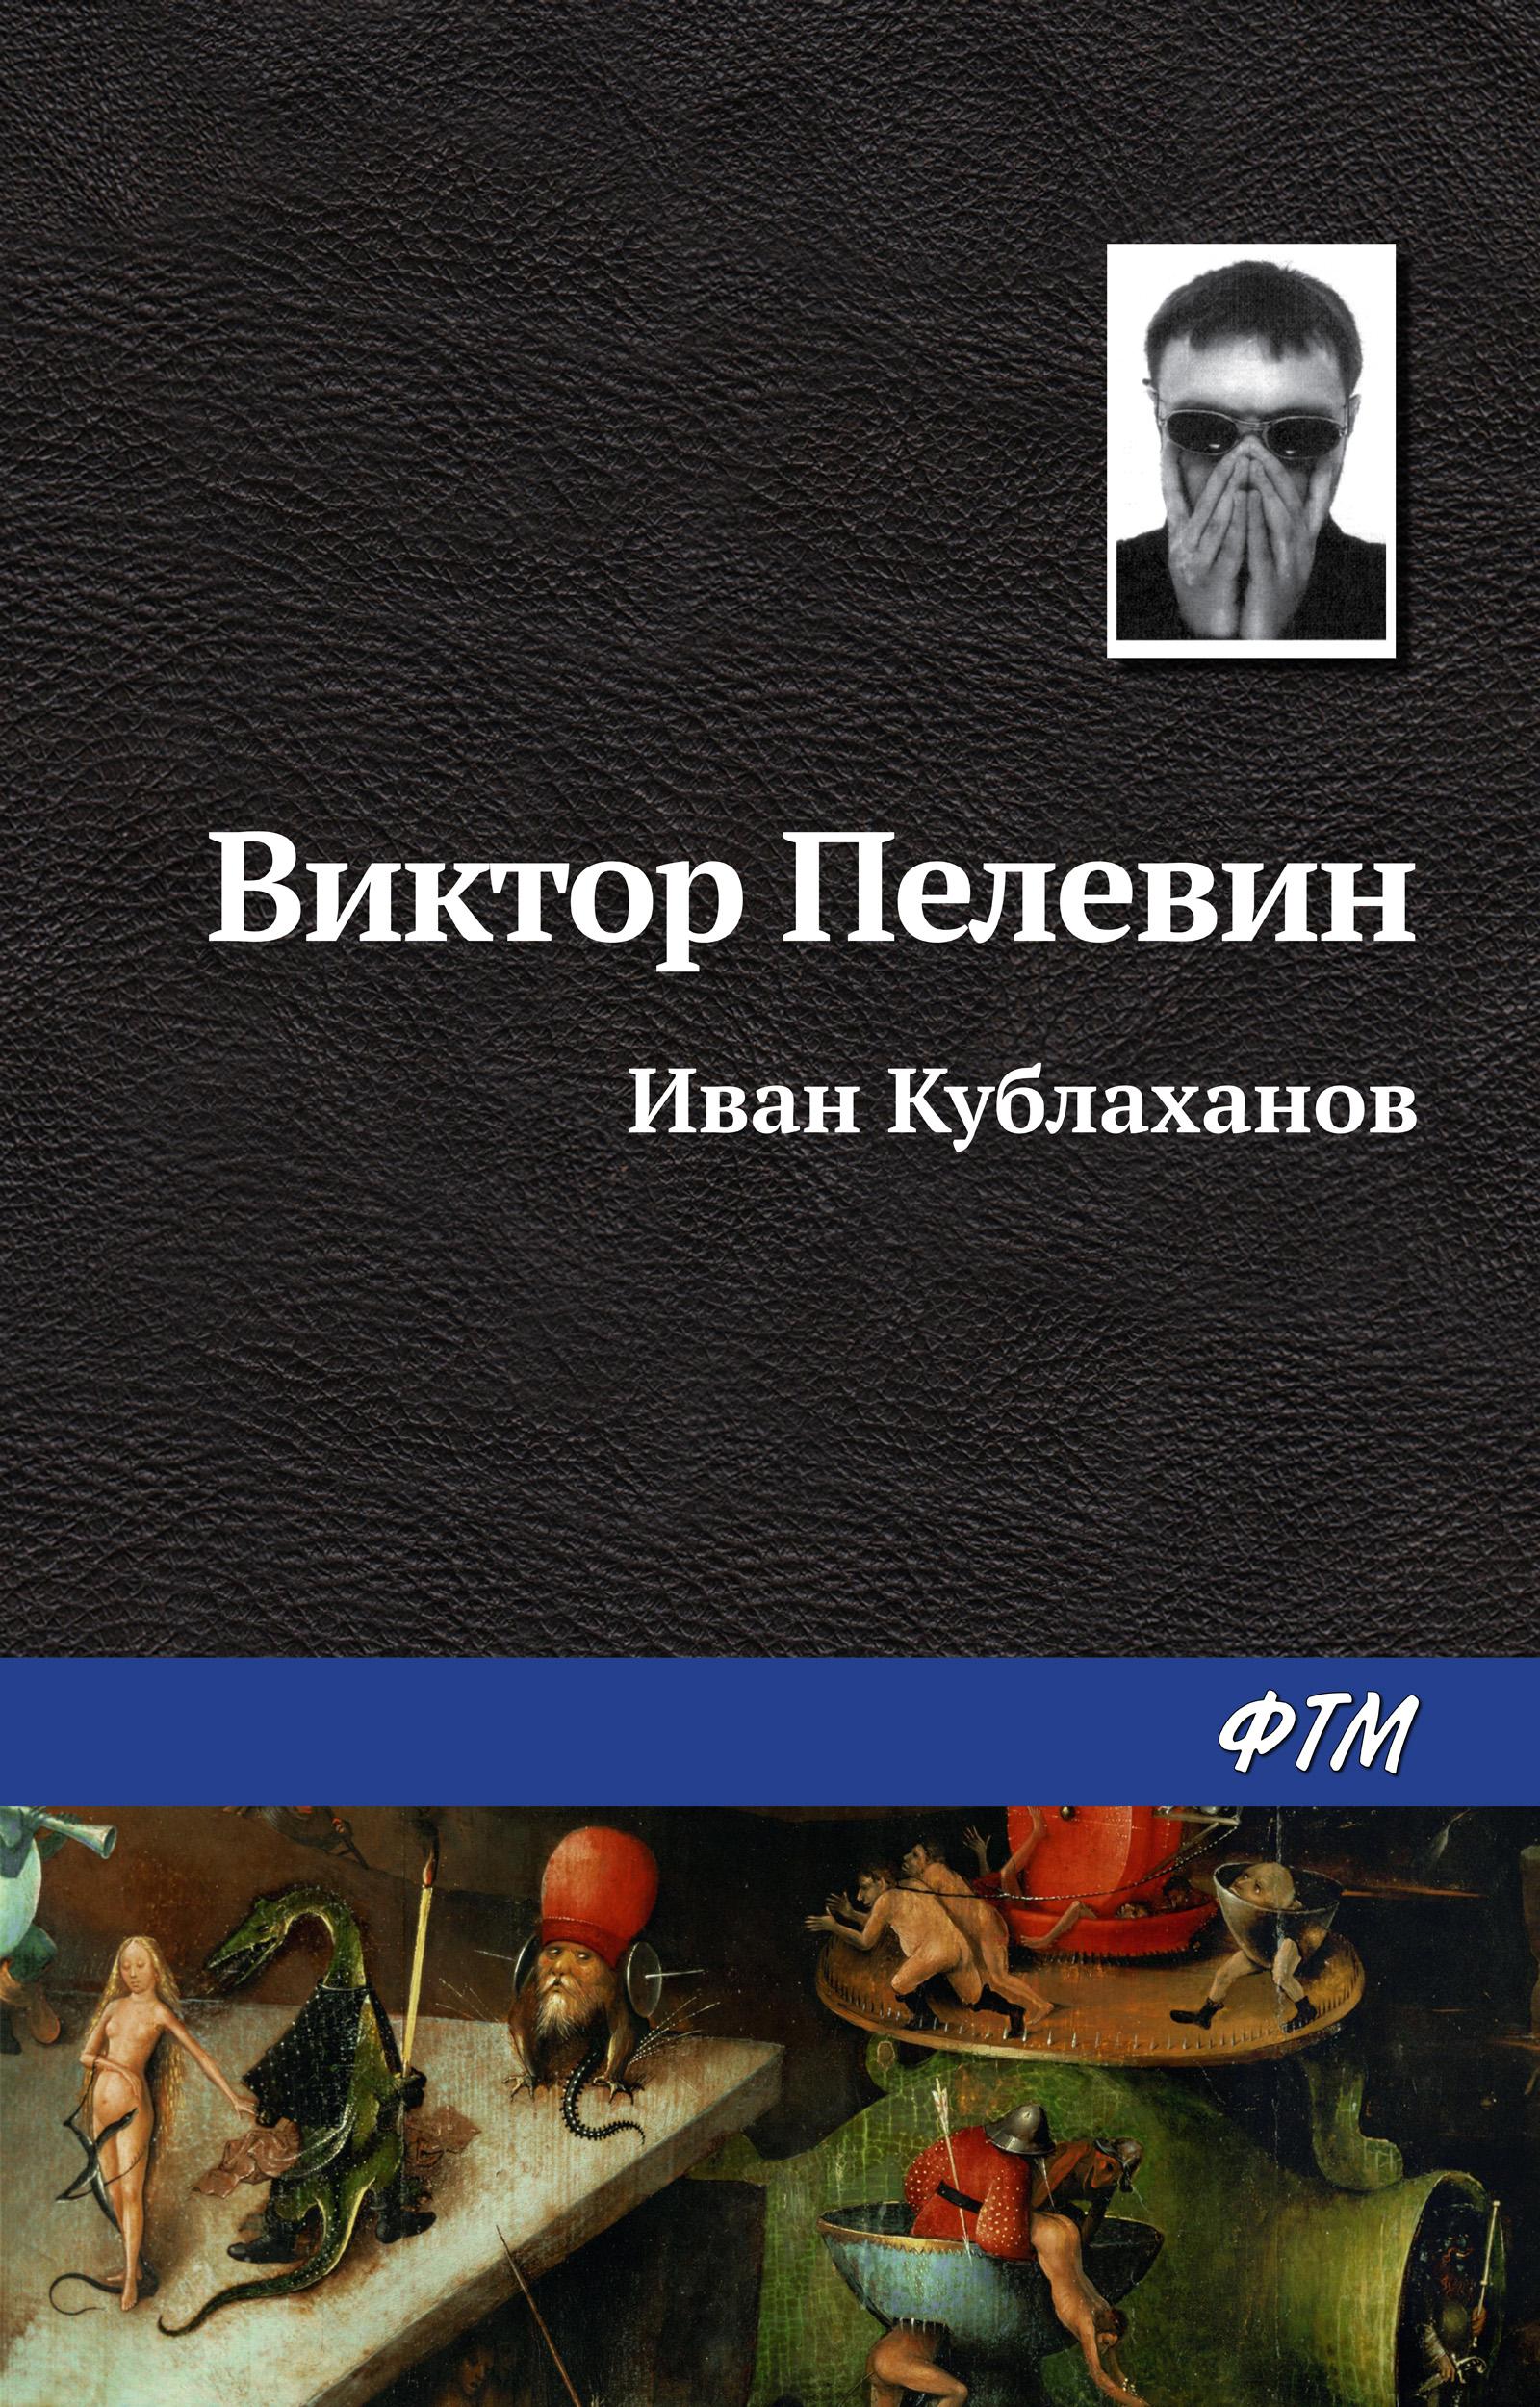 Иван Кублаханов